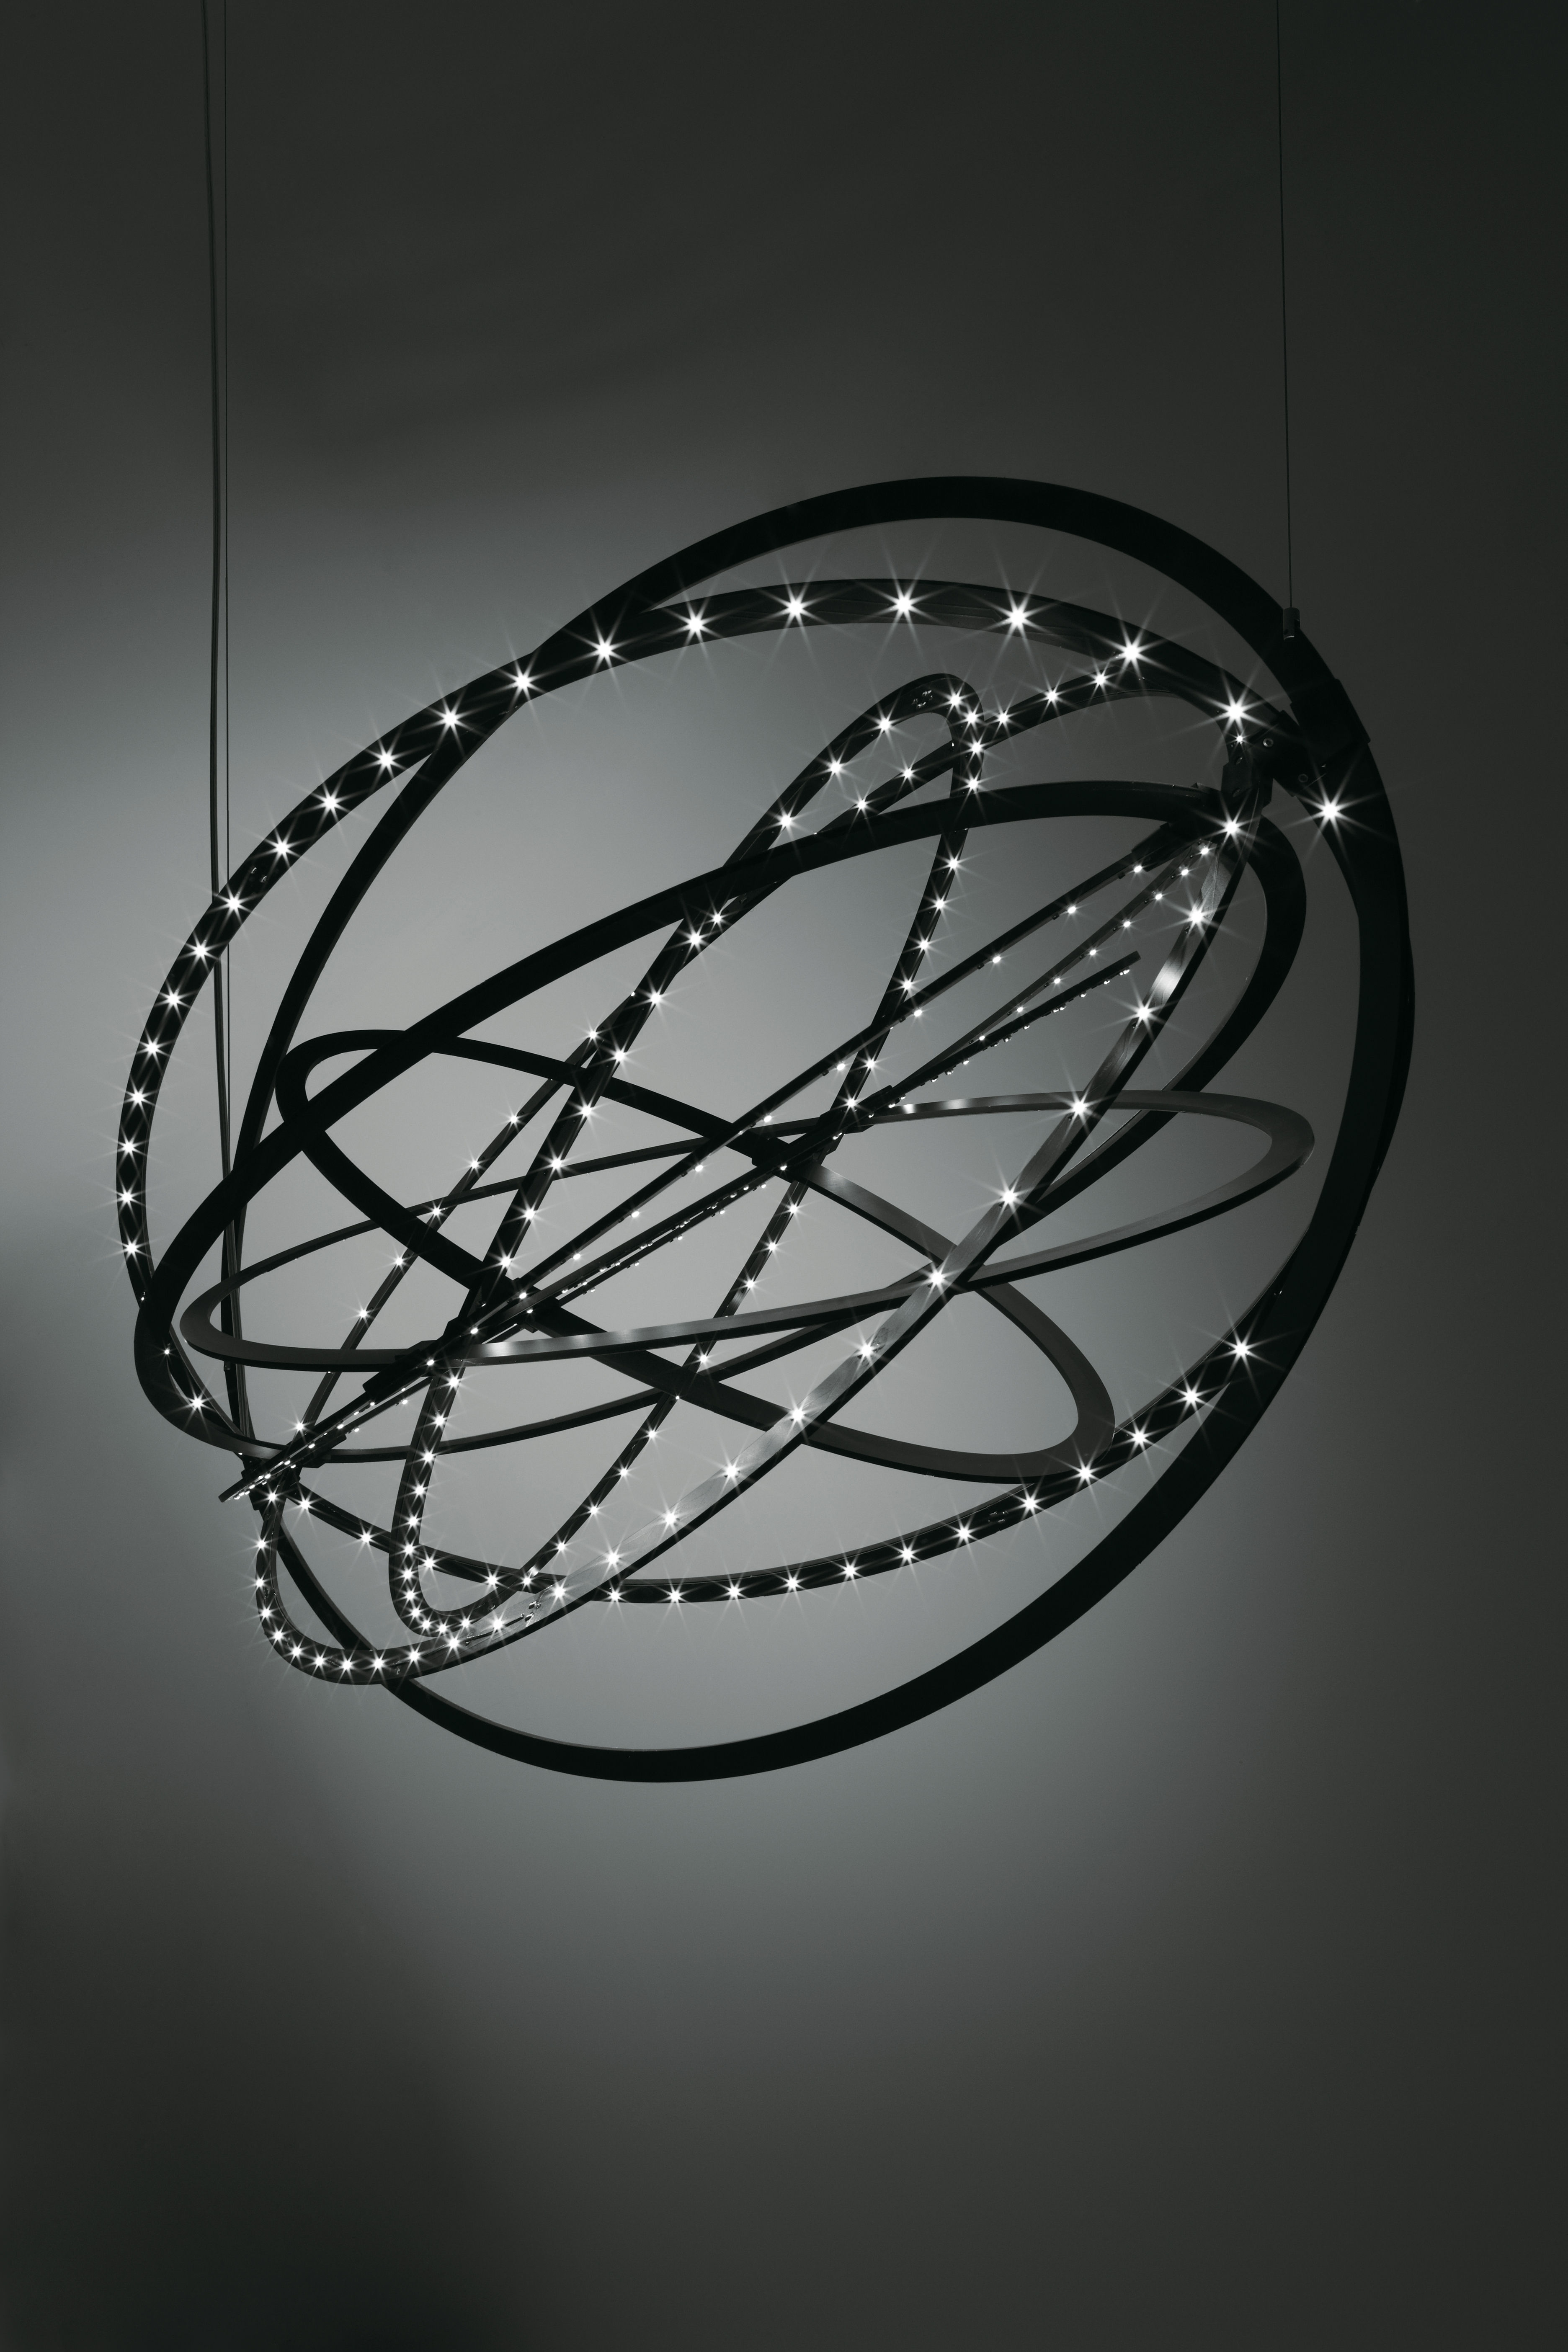 Lighting - Pendant Lighting - Copernico Pendant - LED - Modular - Ø 104 cm by Artemide - Black - Painted aluminium